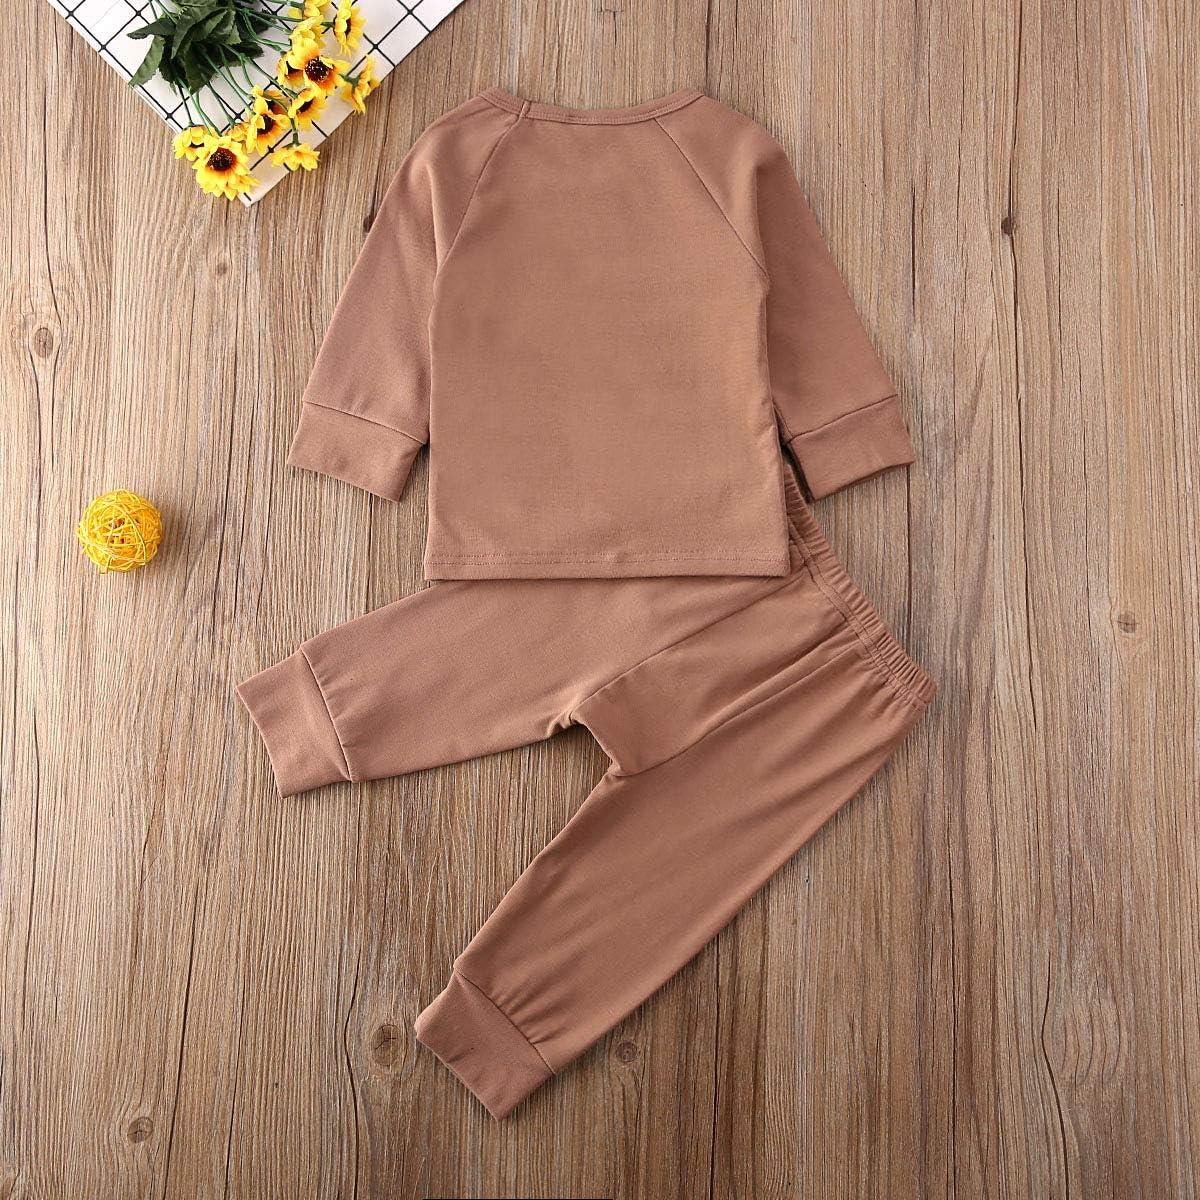 Liyamiee Newborn Baby Boy Girl Clothes Outfit Long Sleeve Shirt Blouse Tops Harem Drawstring Pants Legging Sets